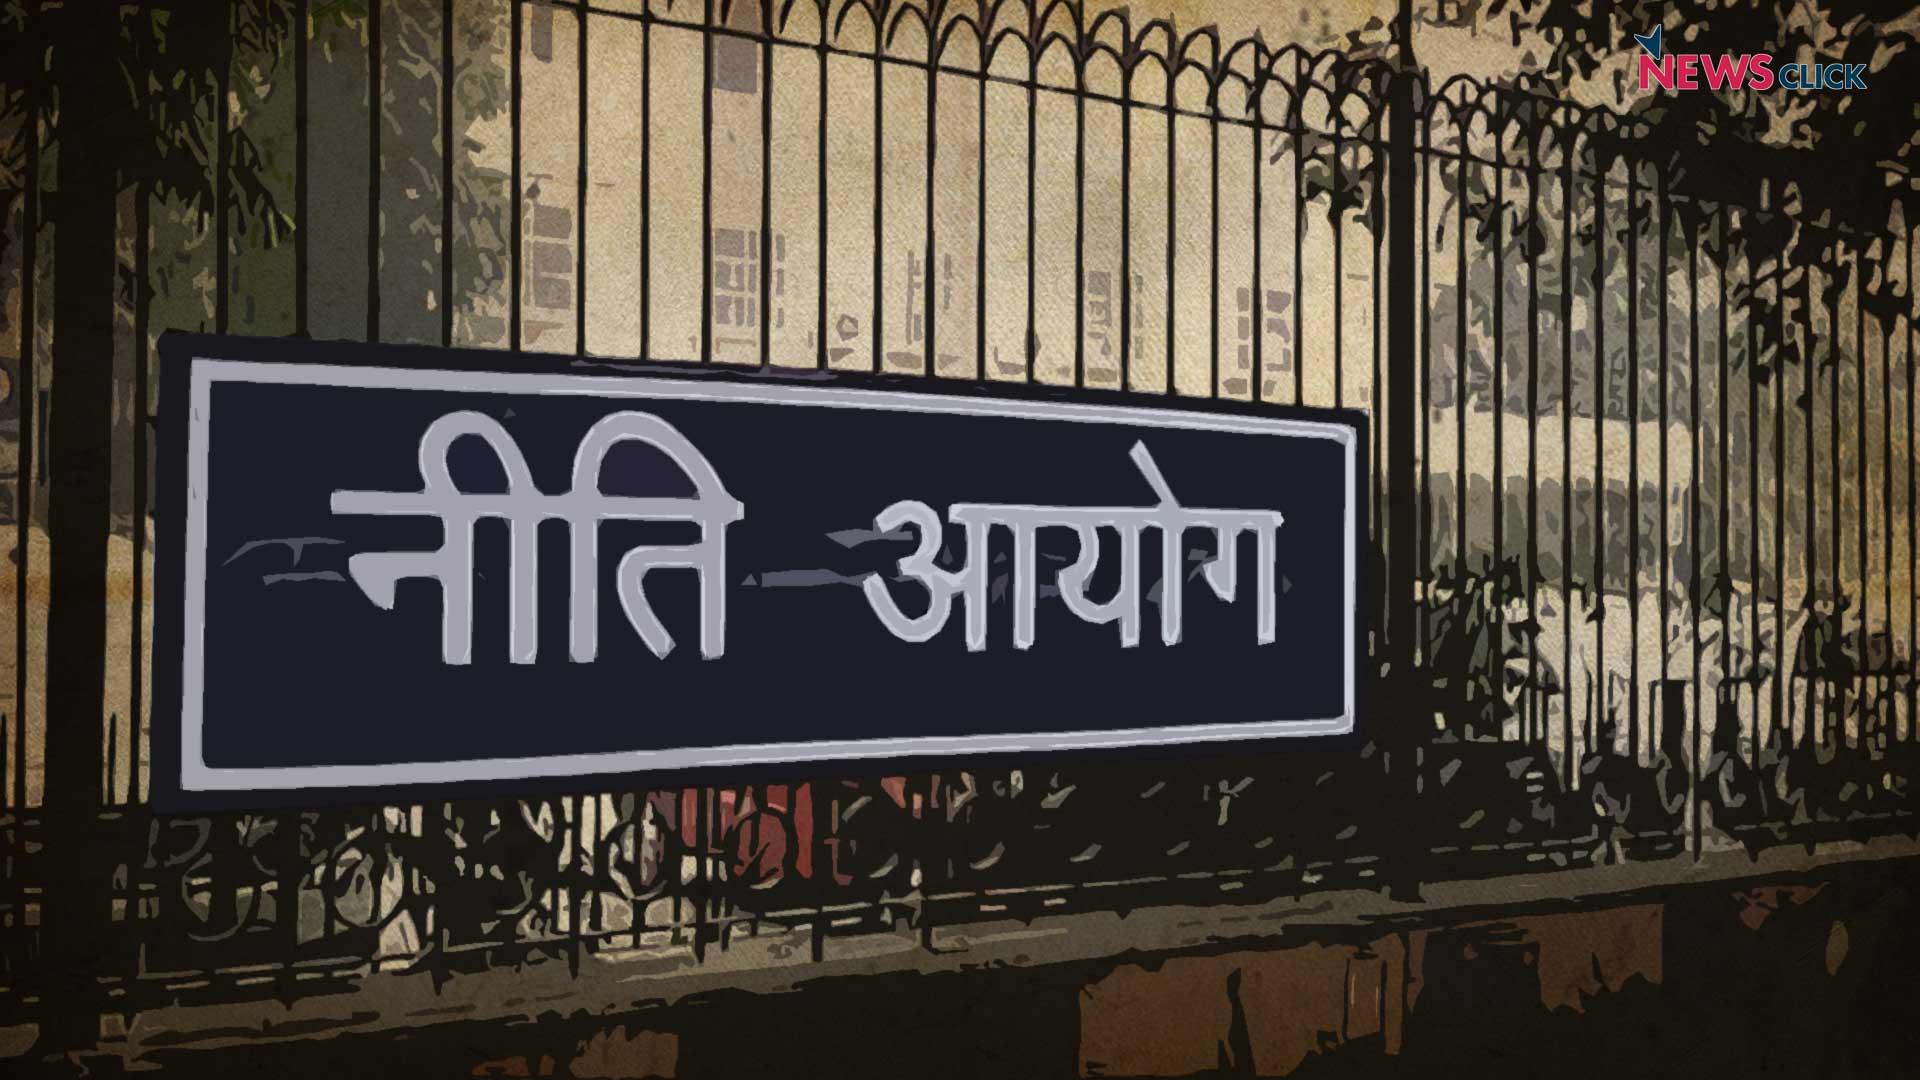 NITI Aayog recommends privatisation of Central Bank, Indian Overseas Bank   இந்திய வெளிநாட்டு வங்கியான சென்ட்ரல் வங்கியை தனியார்மயமாக்க NITI ஆயோக் பரிந்துரைத்துள்ளது.  _40.1